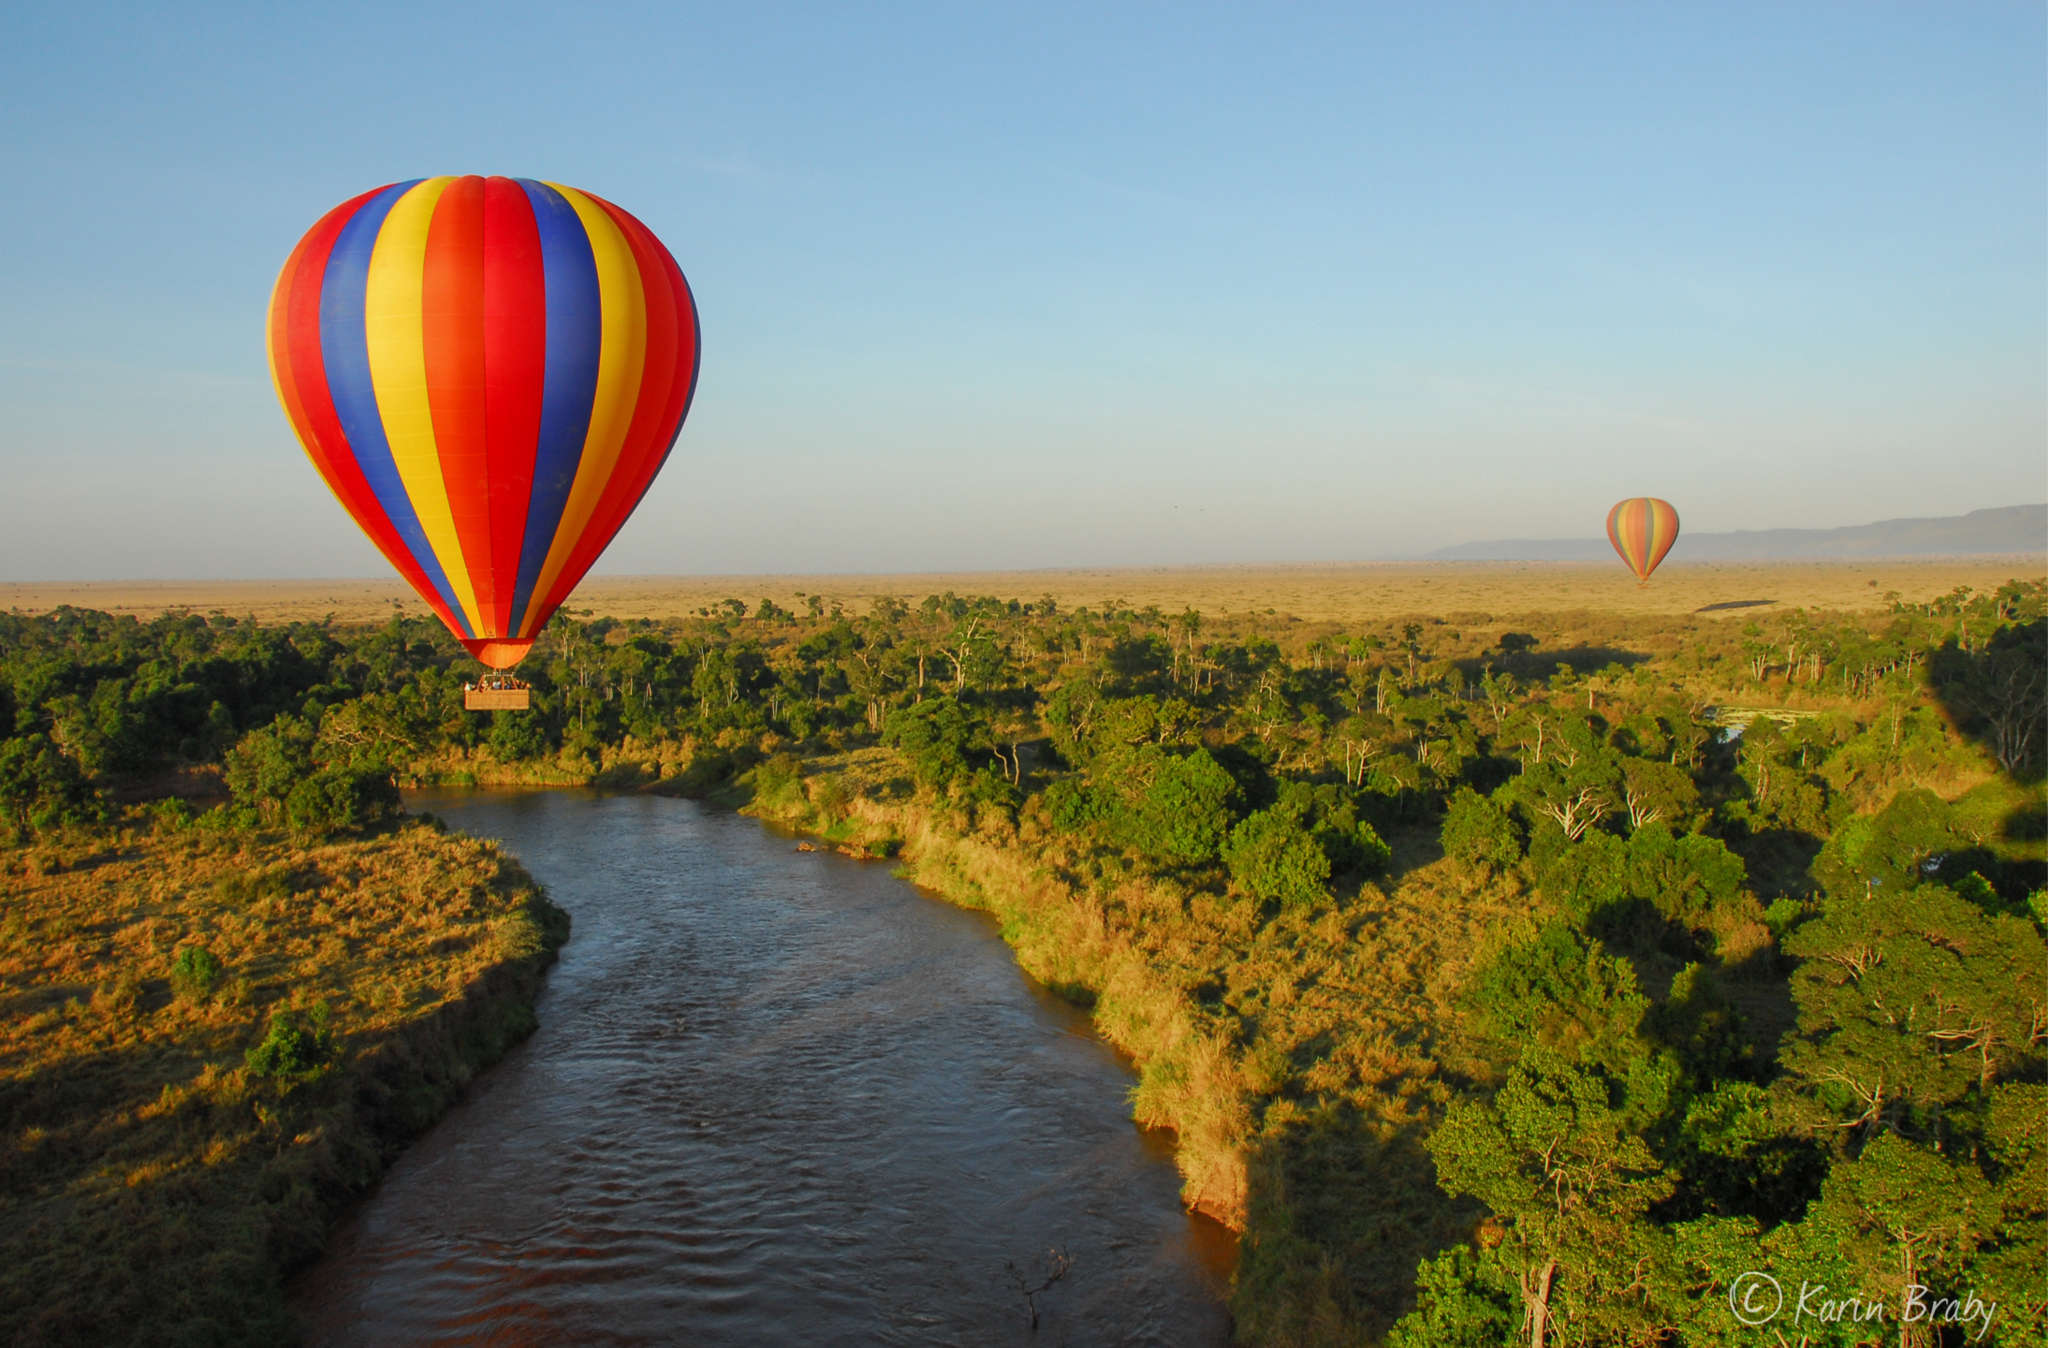 Kenya_Angama Mara_BalloonKMB-271_B